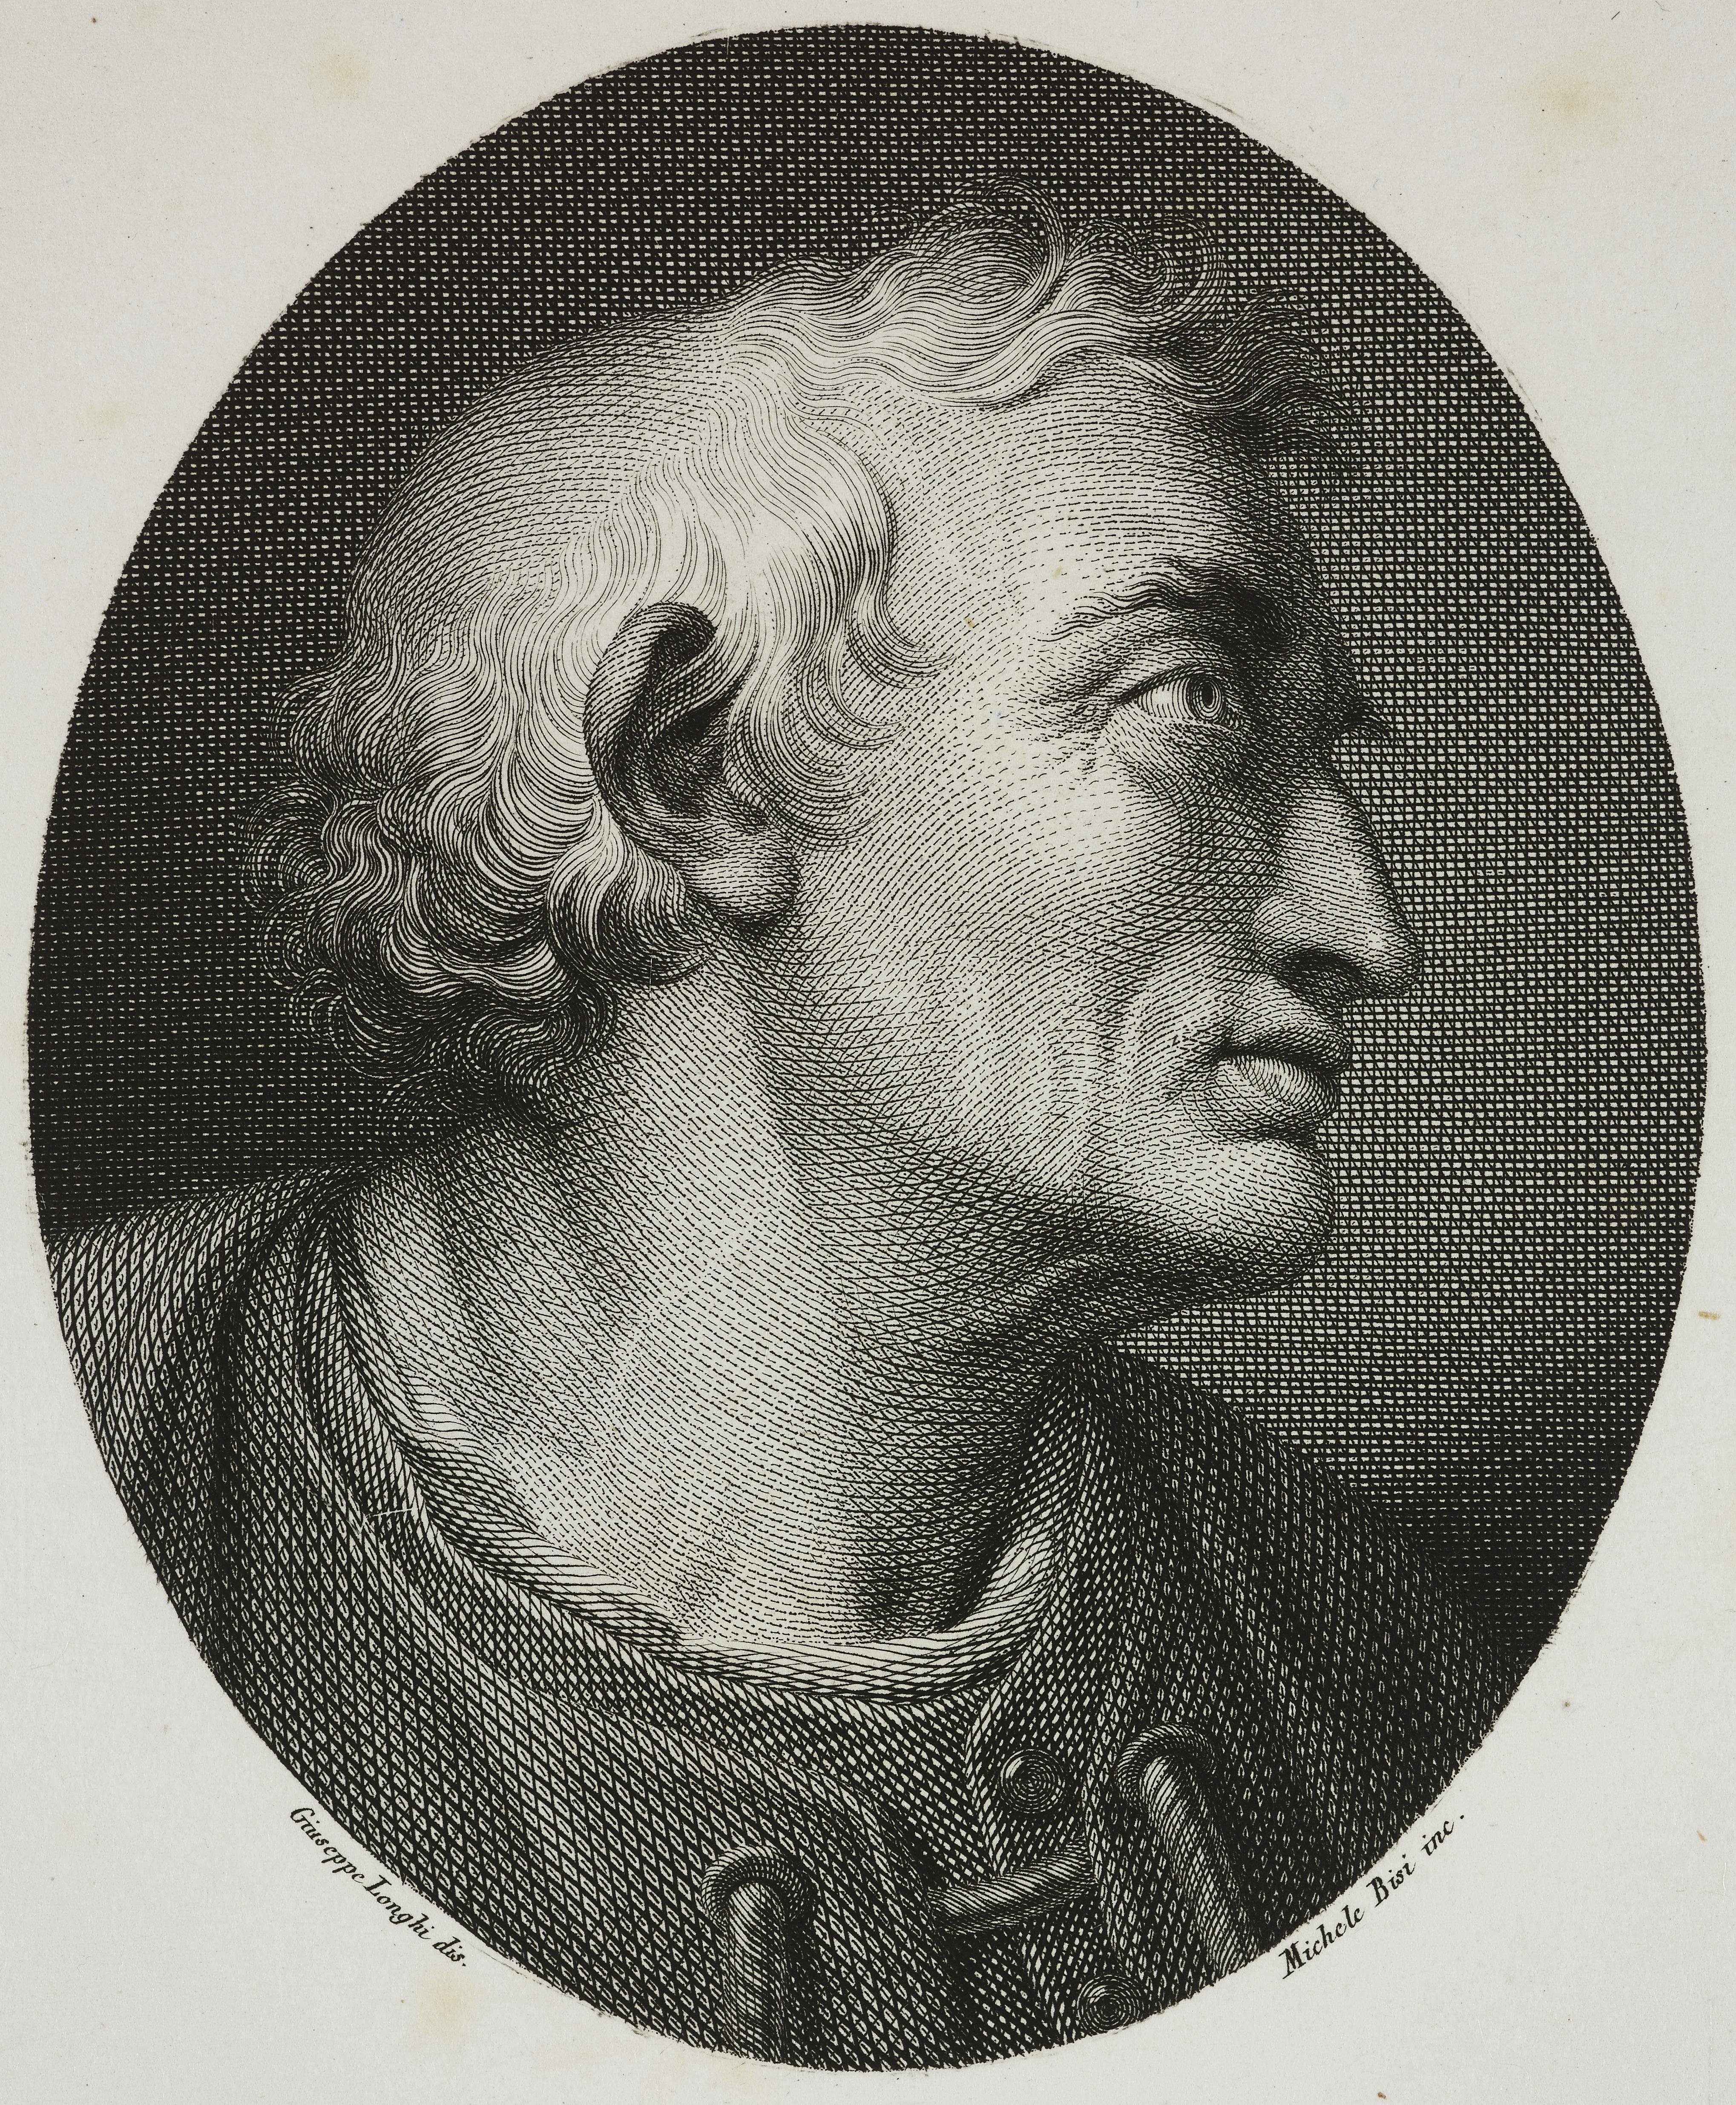 Amerigo Vespucci, Italian navigator and explorer